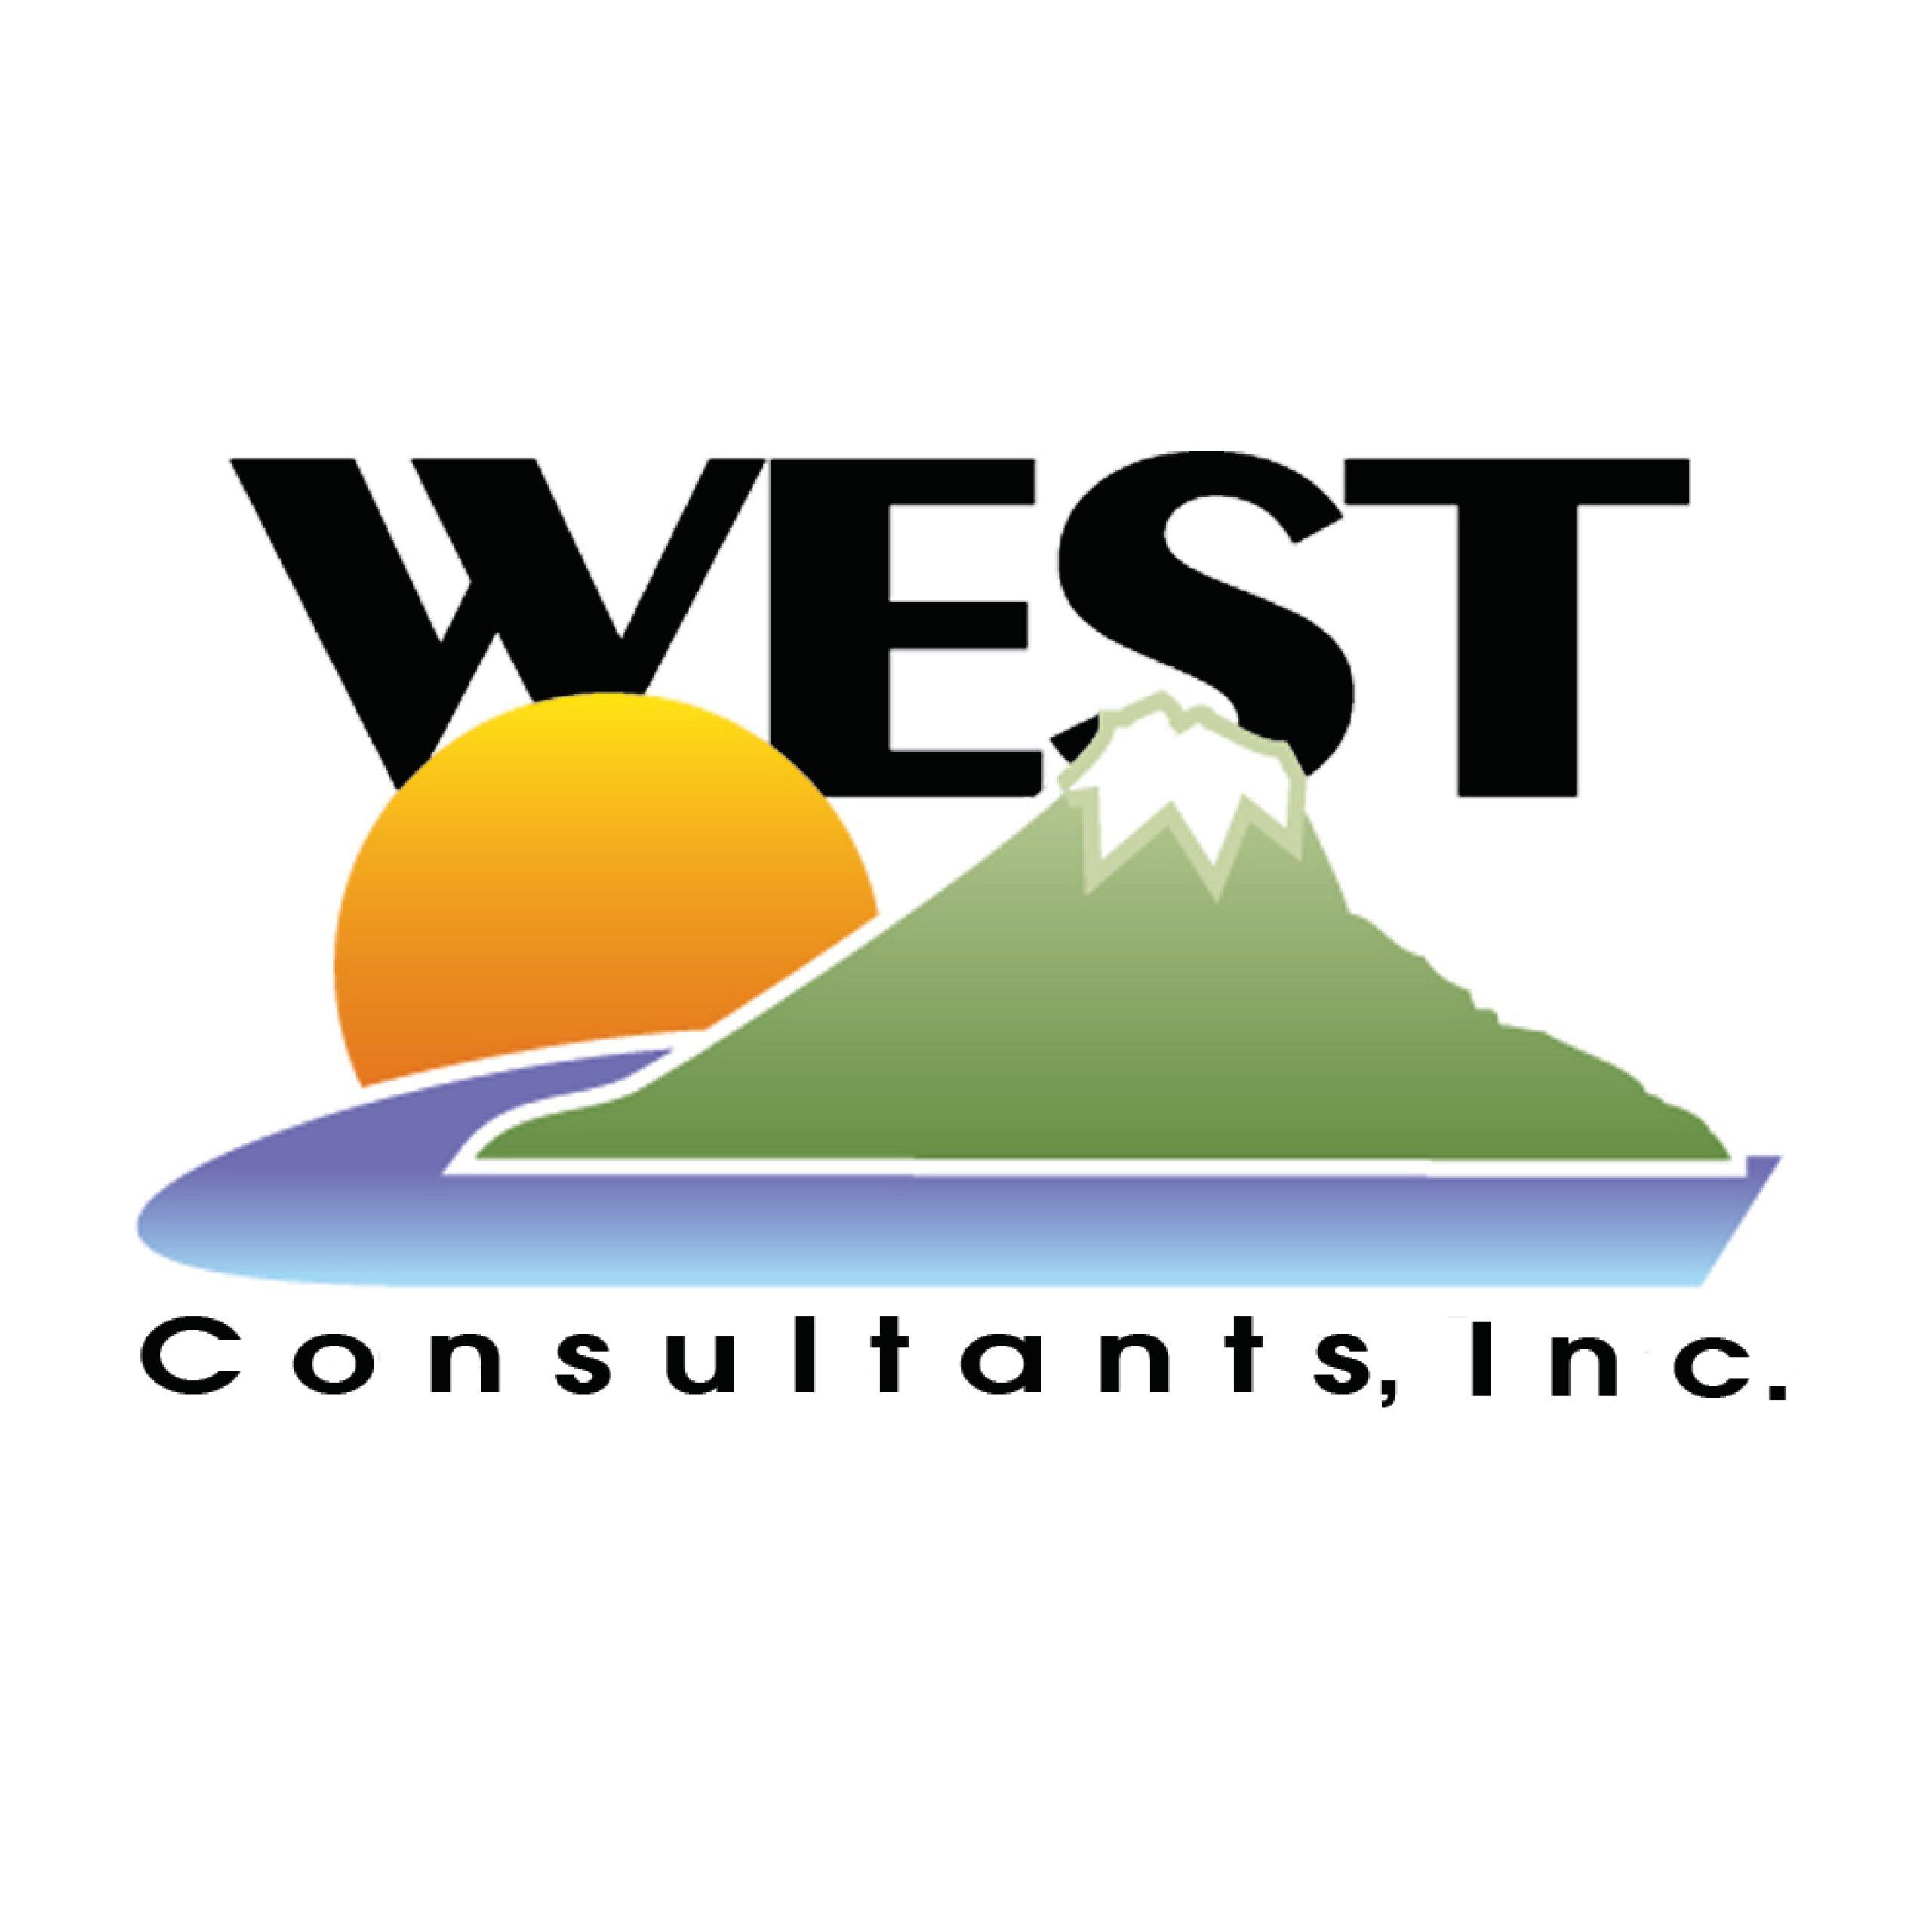 West Consultants